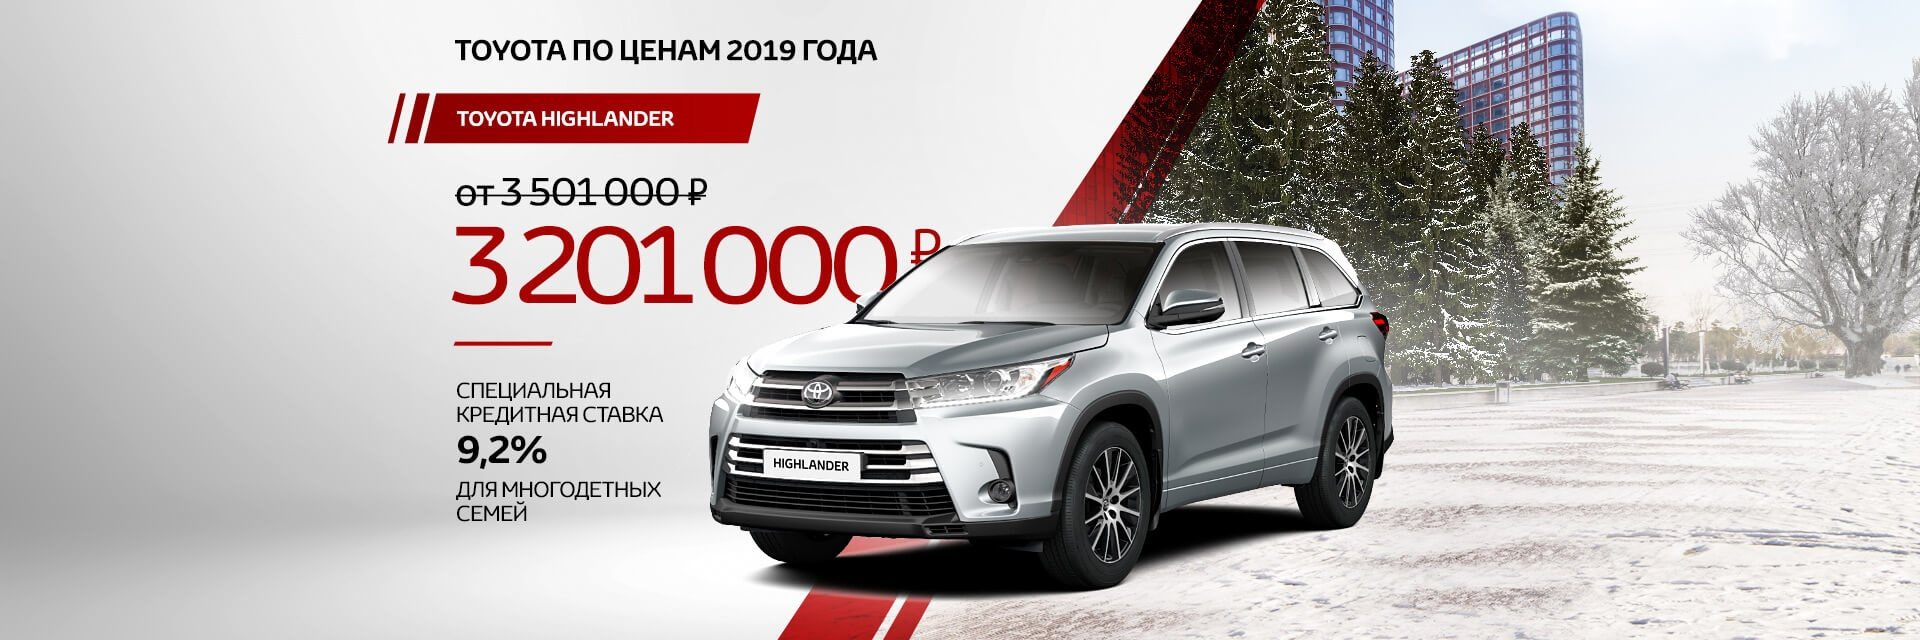 Авто в кредит в москве онлайн взять кредит 3000 на неделю